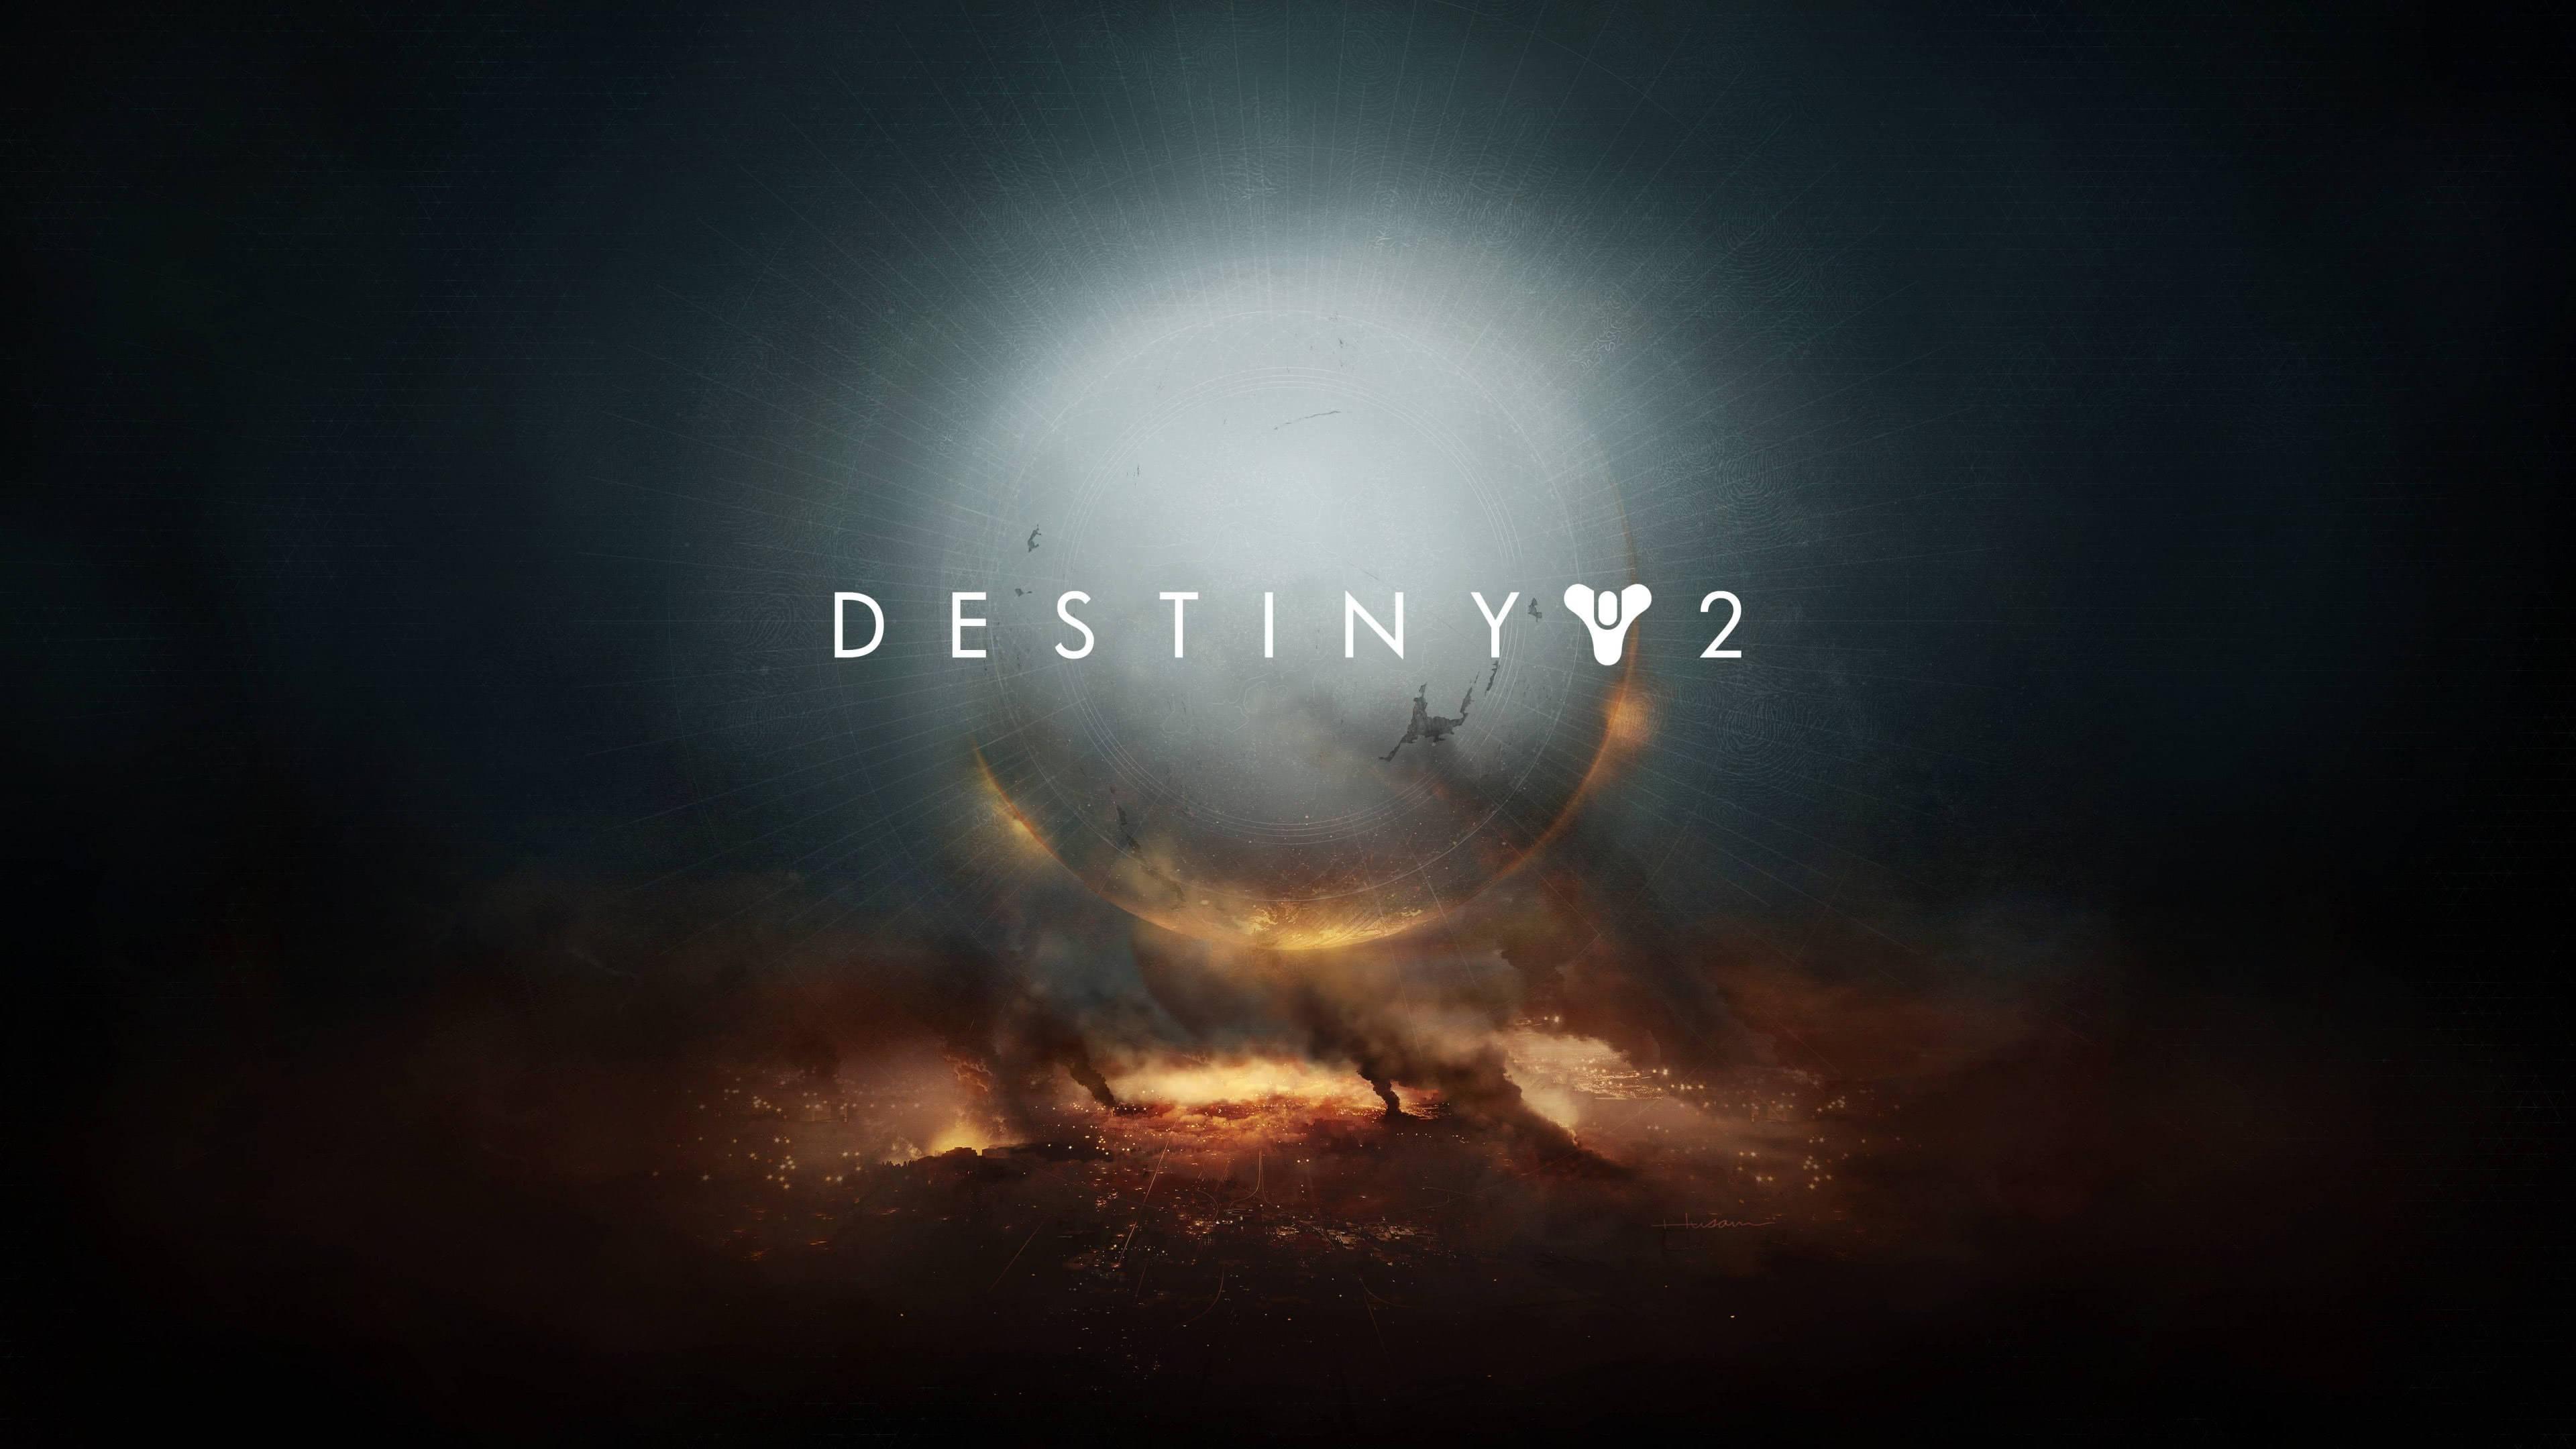 destiny 2 logo uhd 4k wallpaper